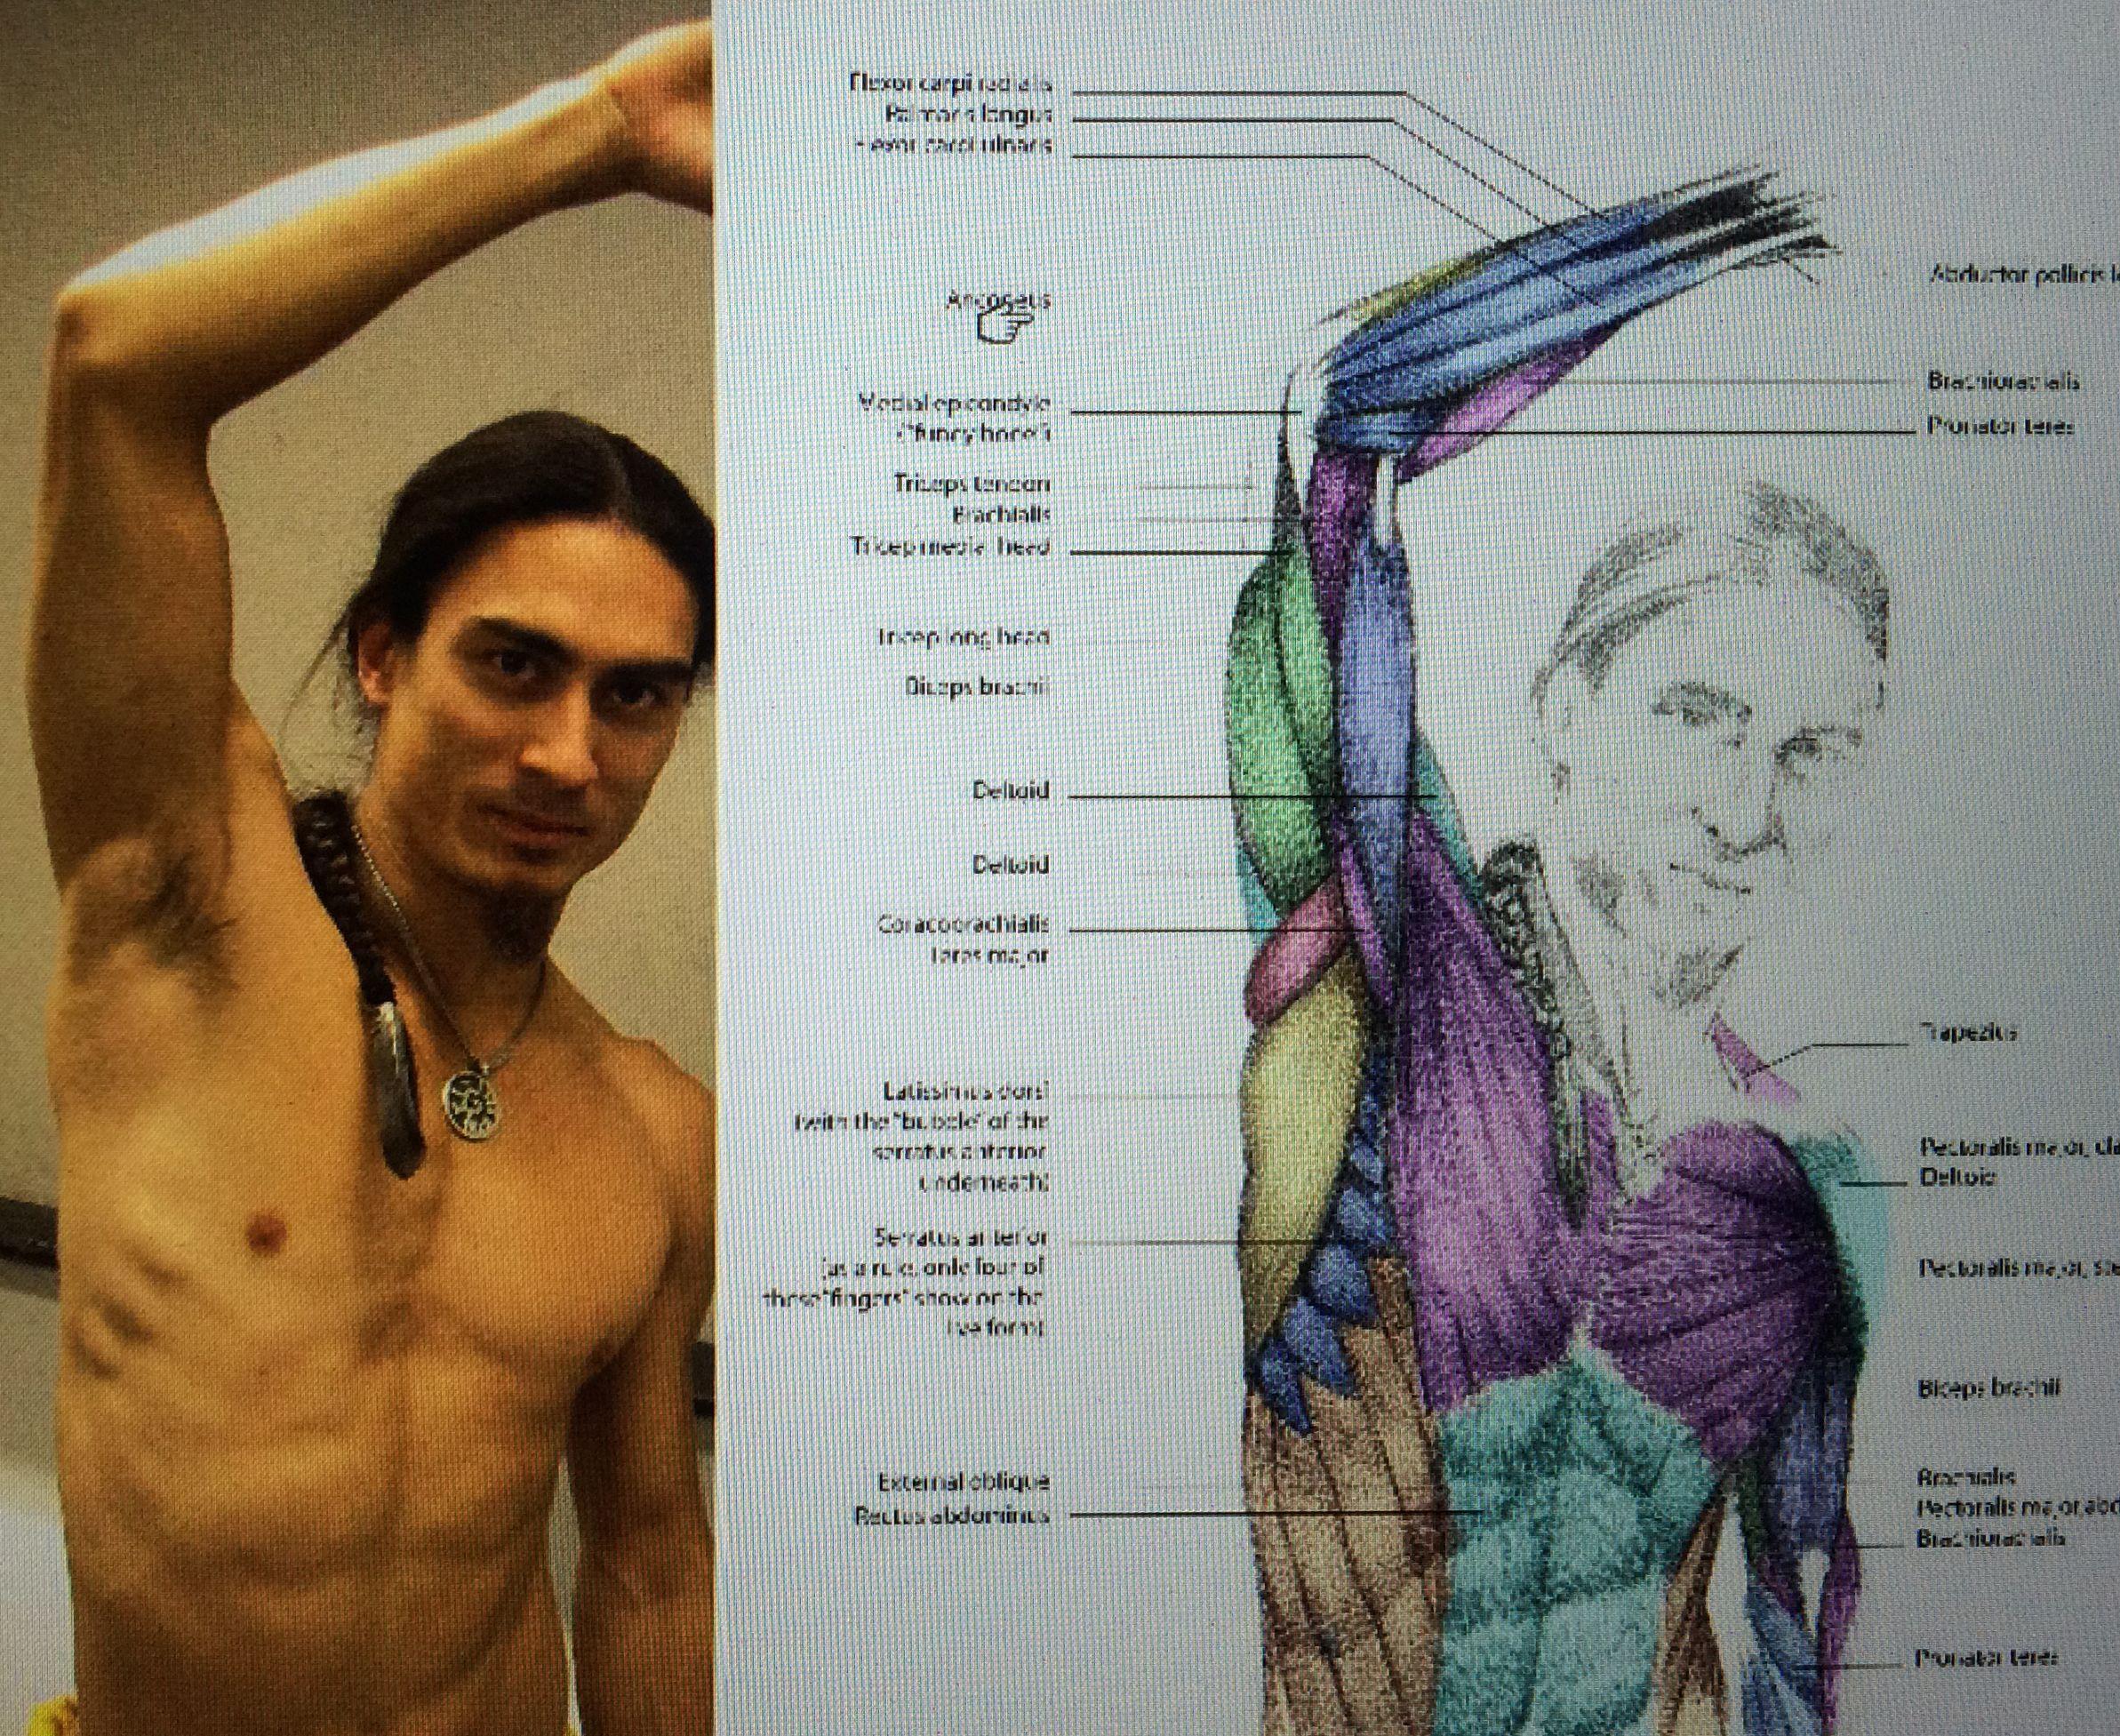 anatomy: raised arm, armpit | Illustration: How-to | Pinterest ...